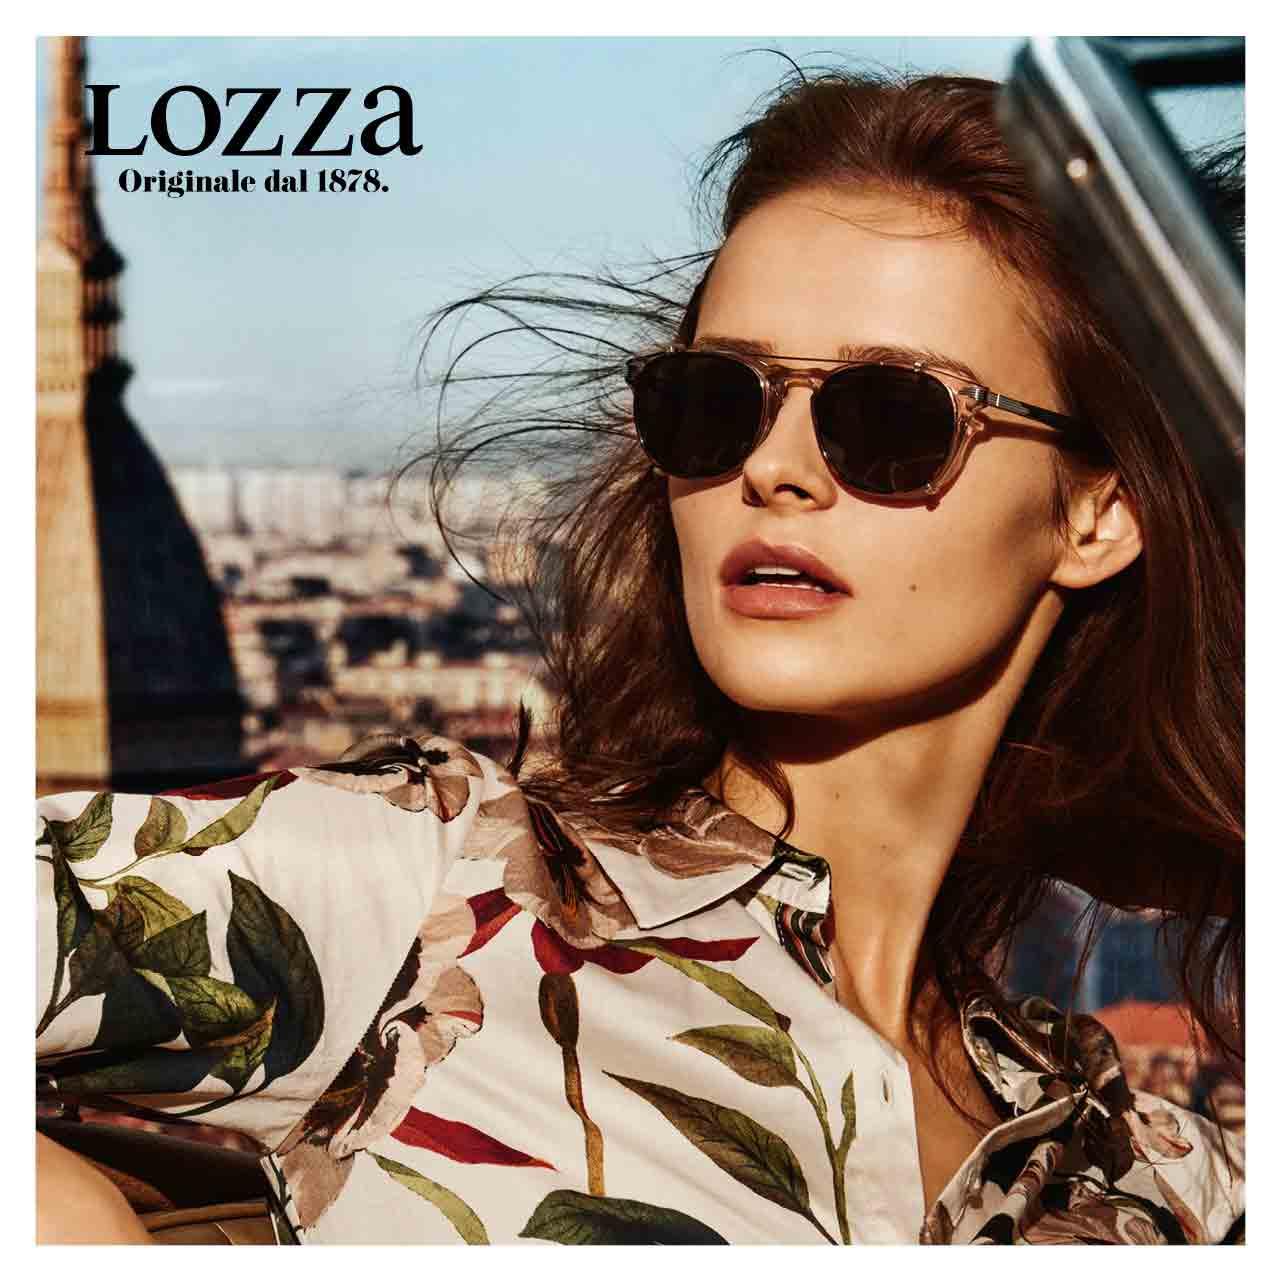 LOZZA FEMME